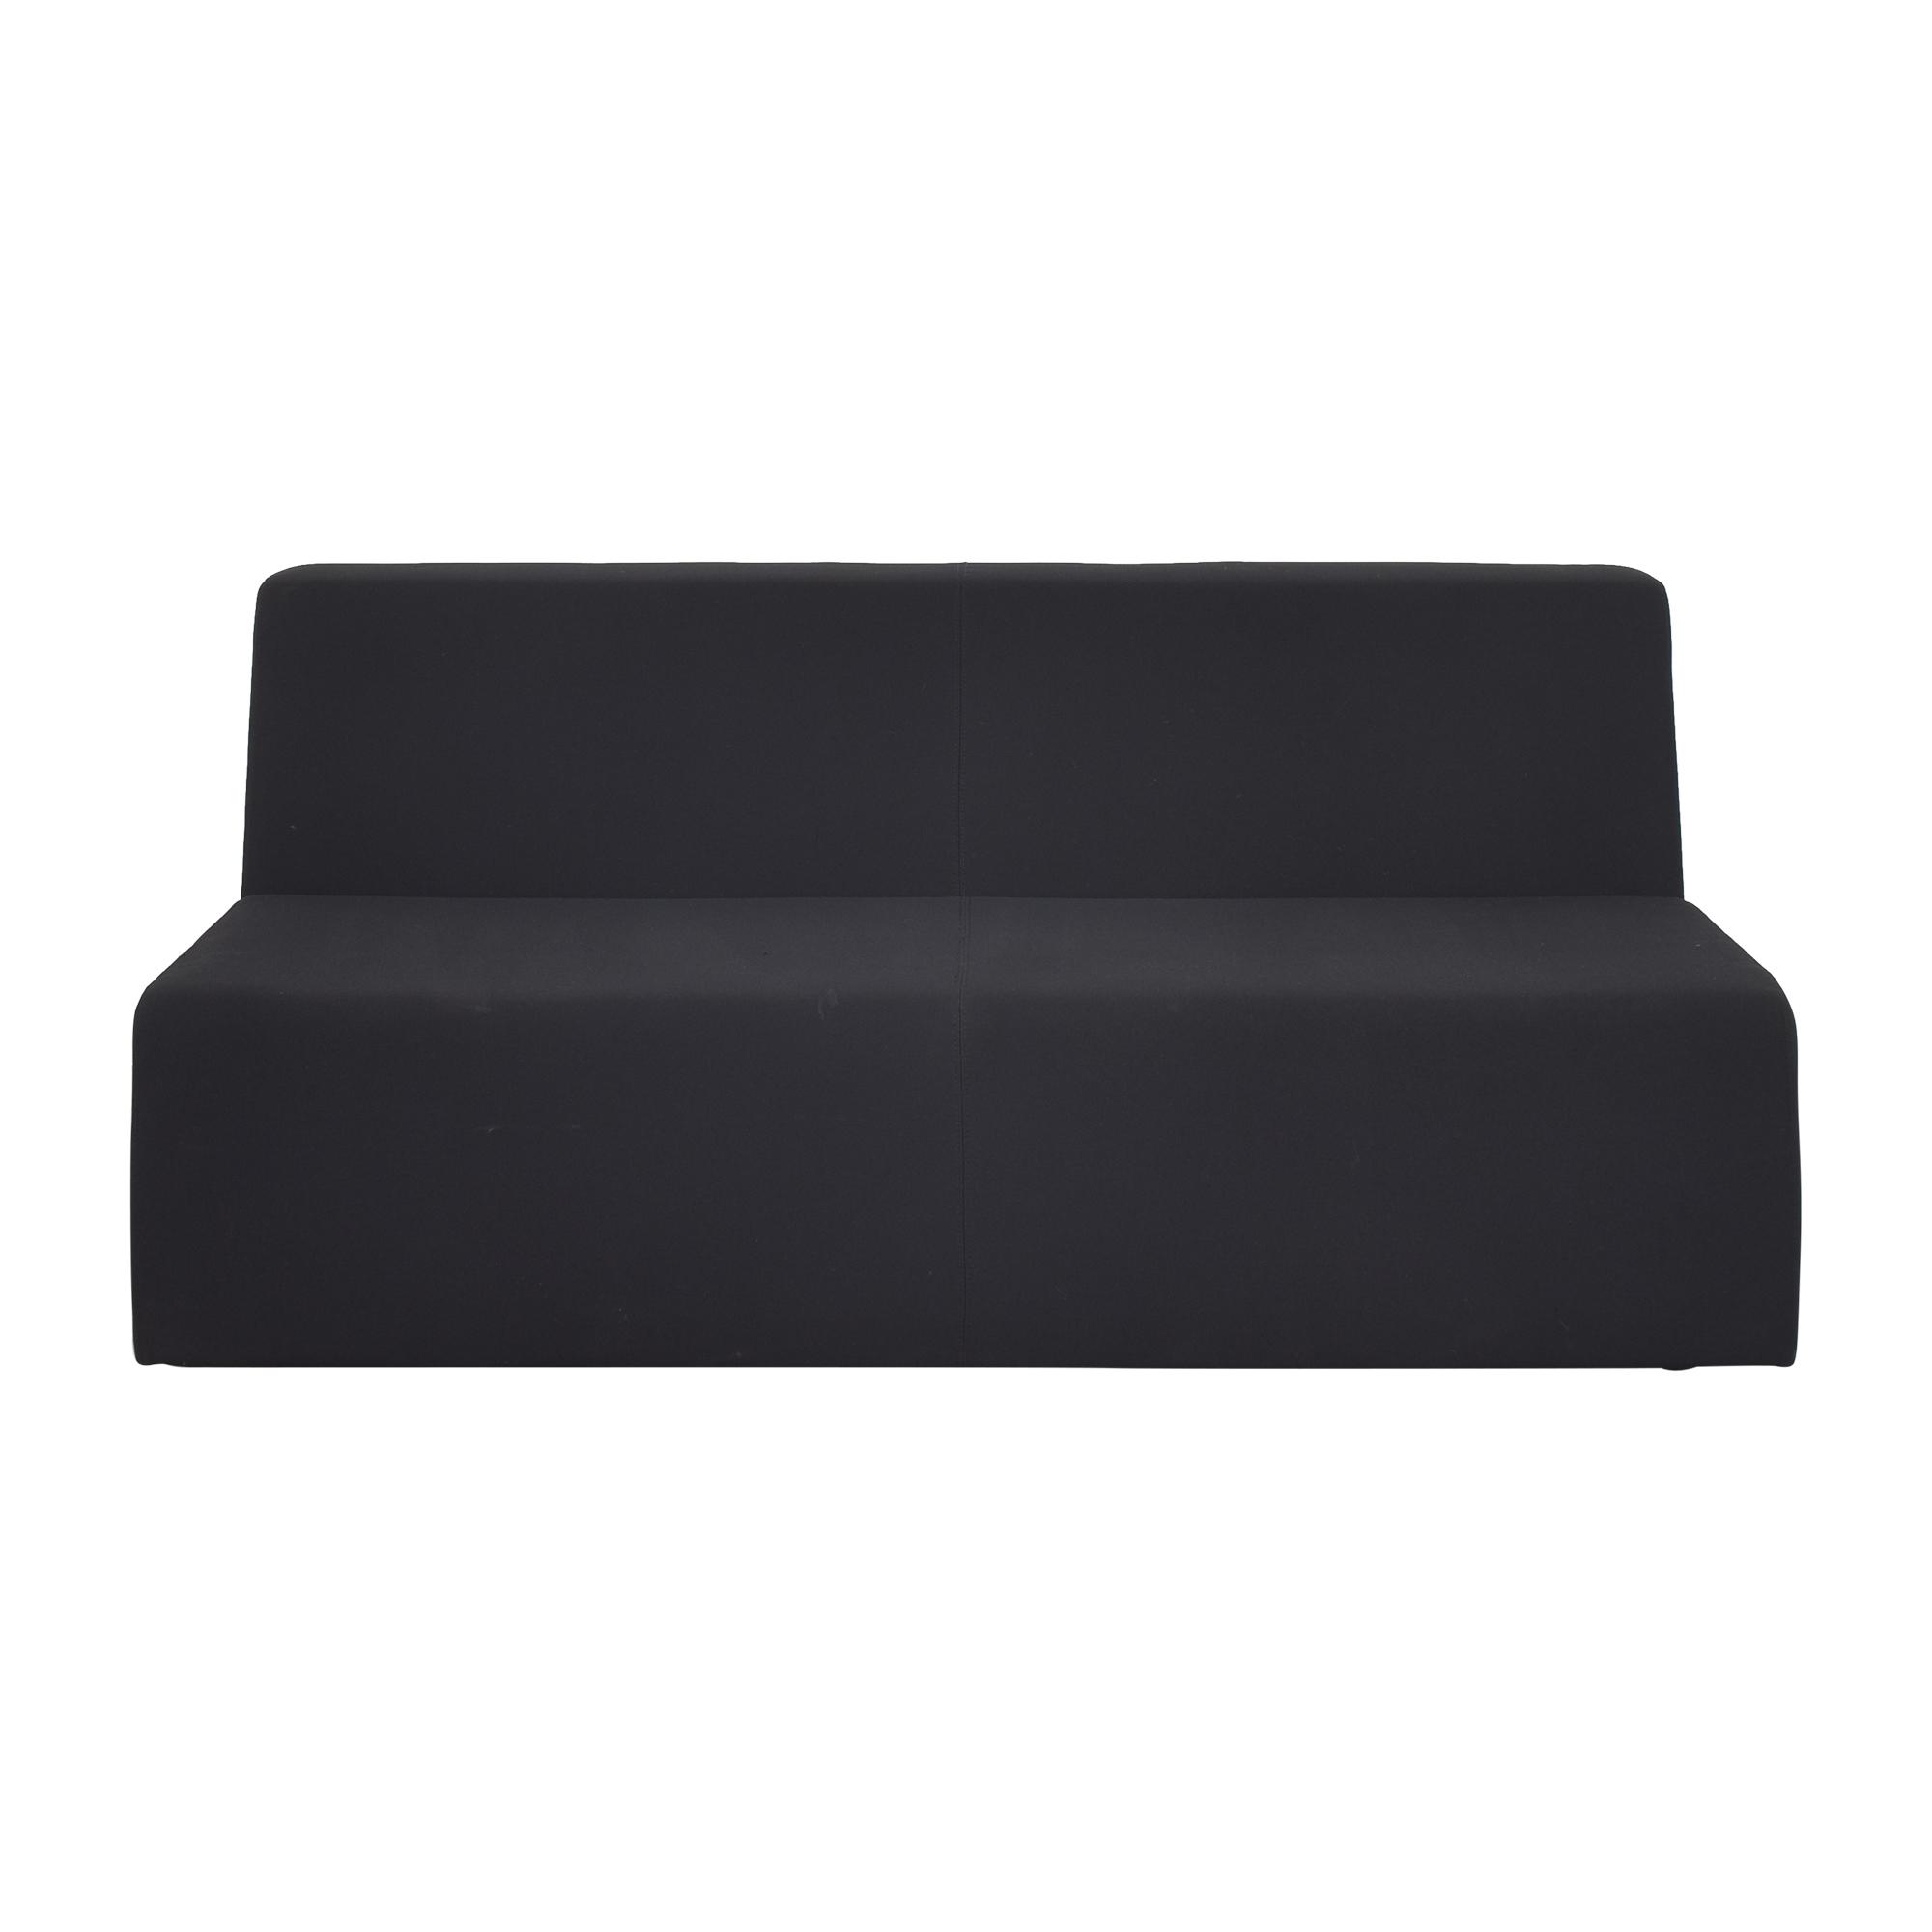 Steelcase Steelcase Turnstone Campfire Big Lounge Sofa dimensions